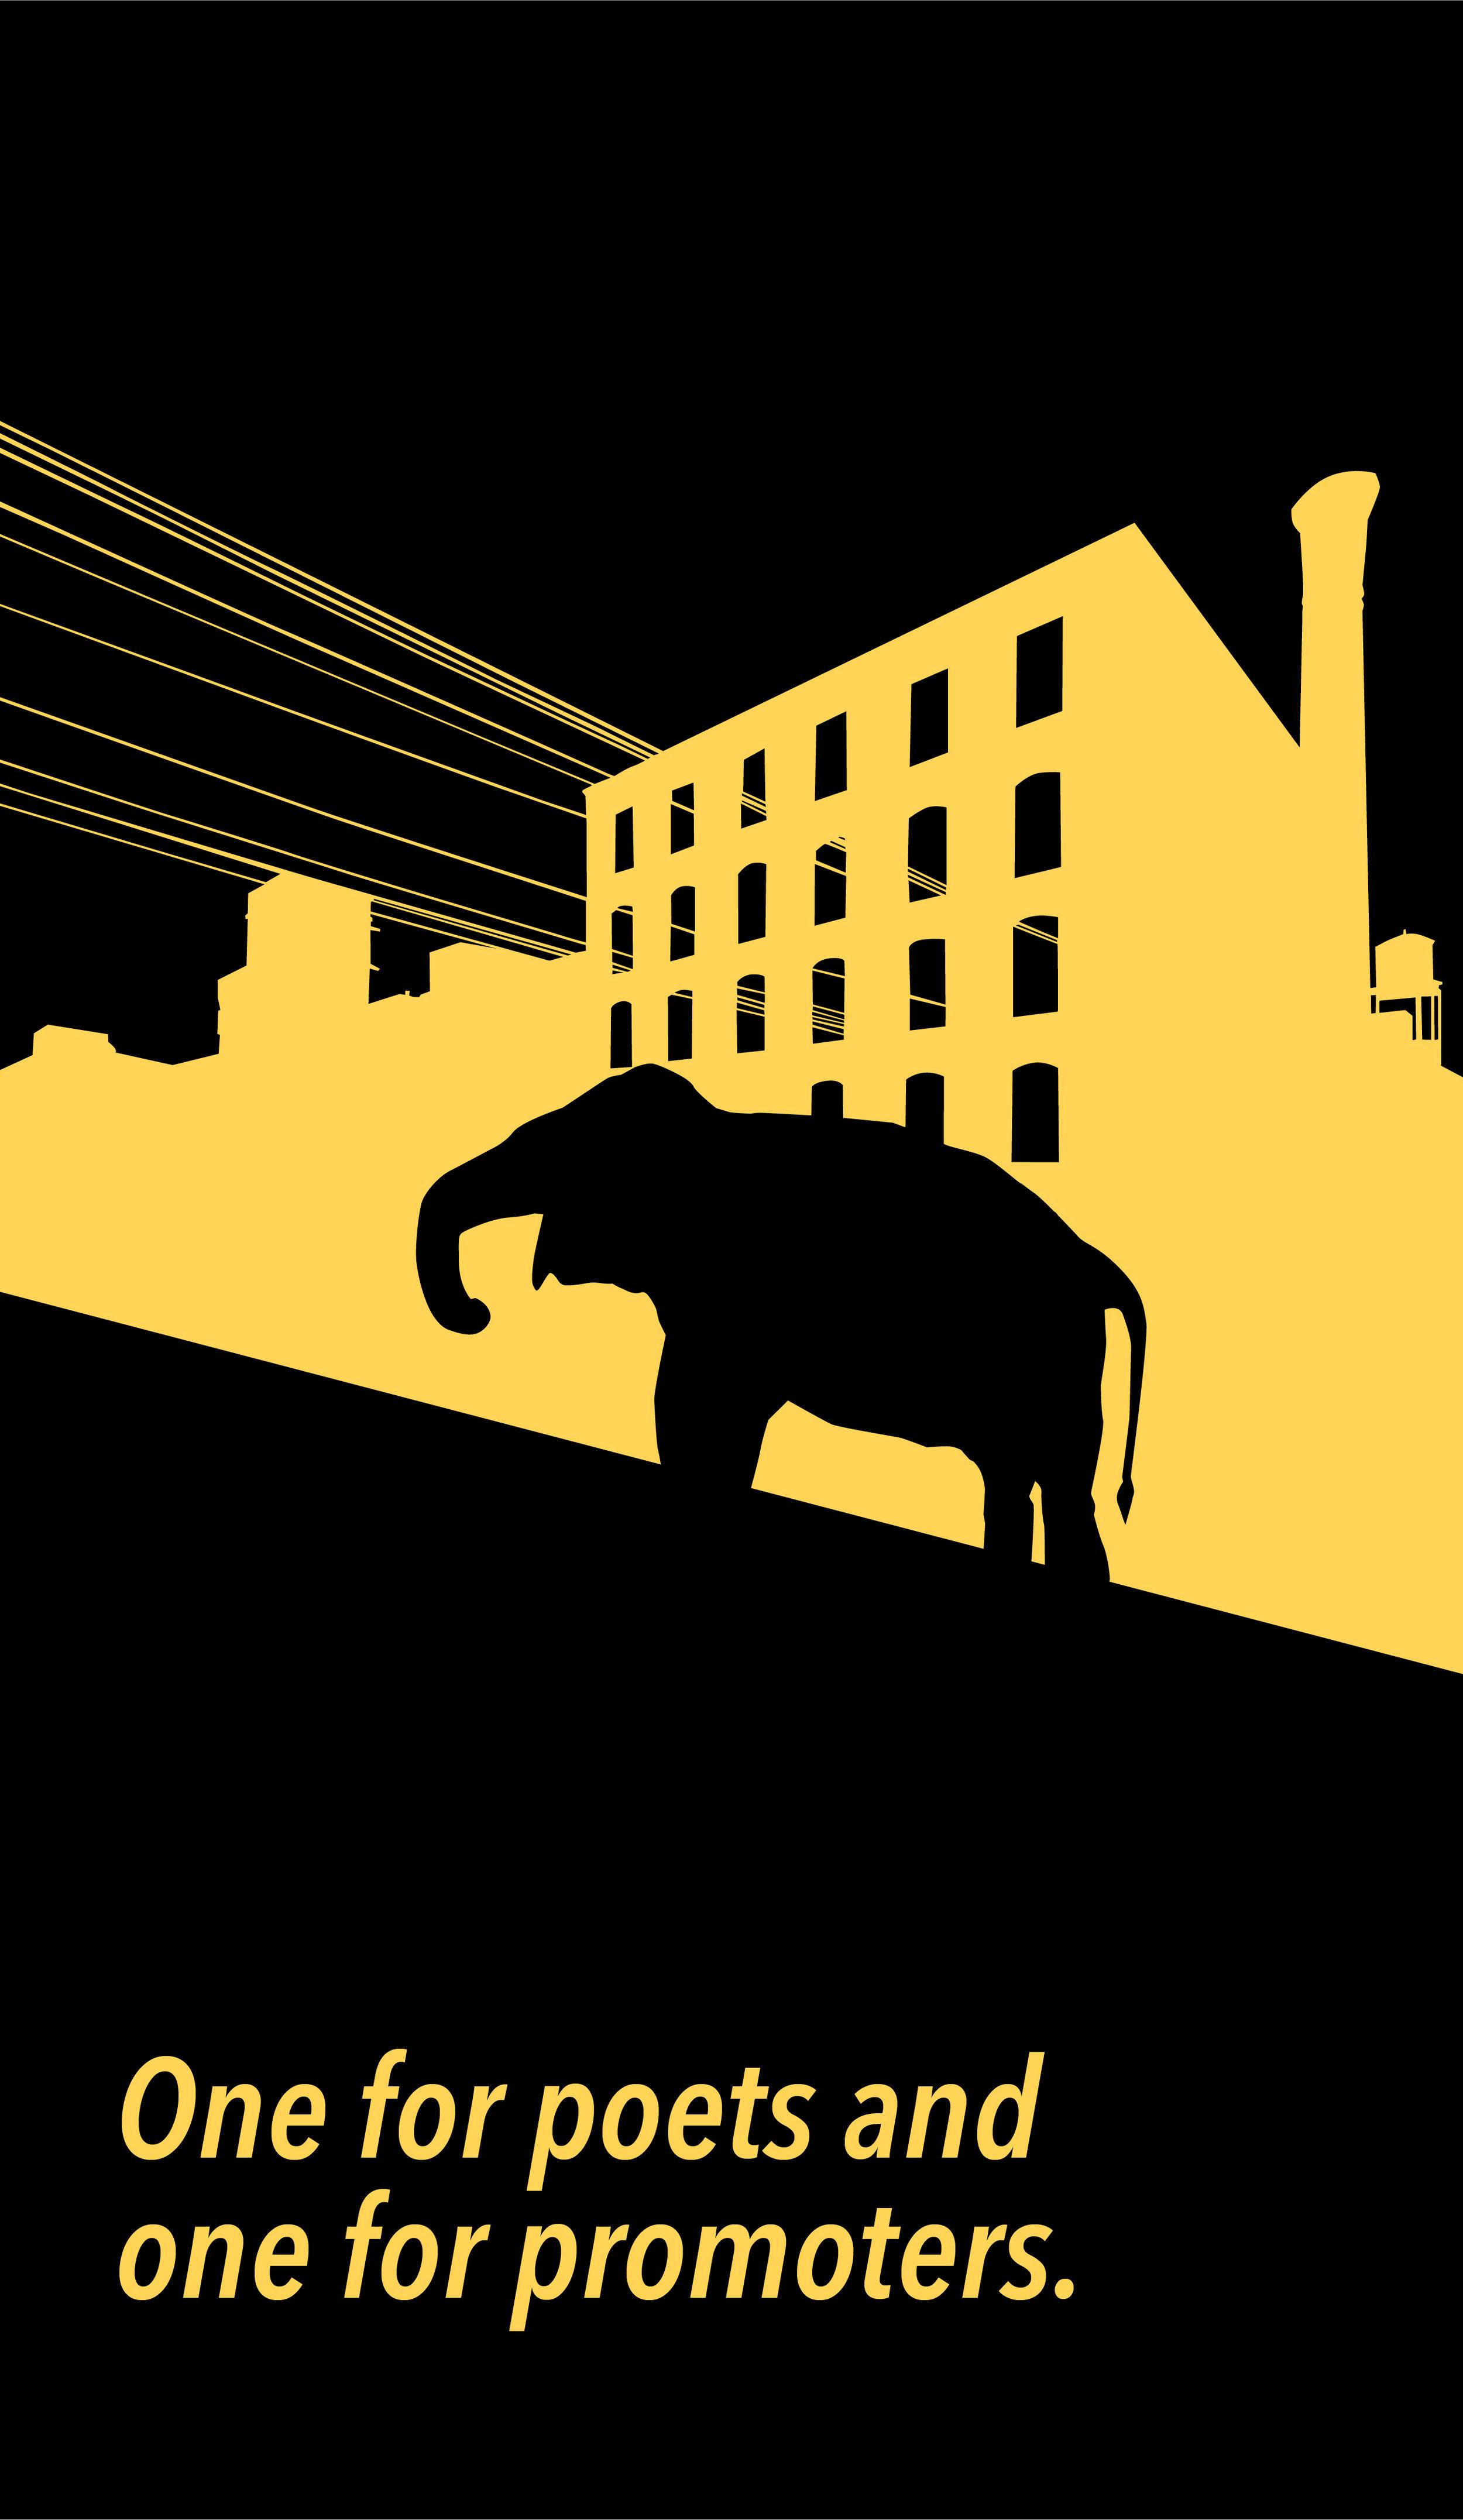 City On The Make - Storyboard - 01.25.1714.jpg